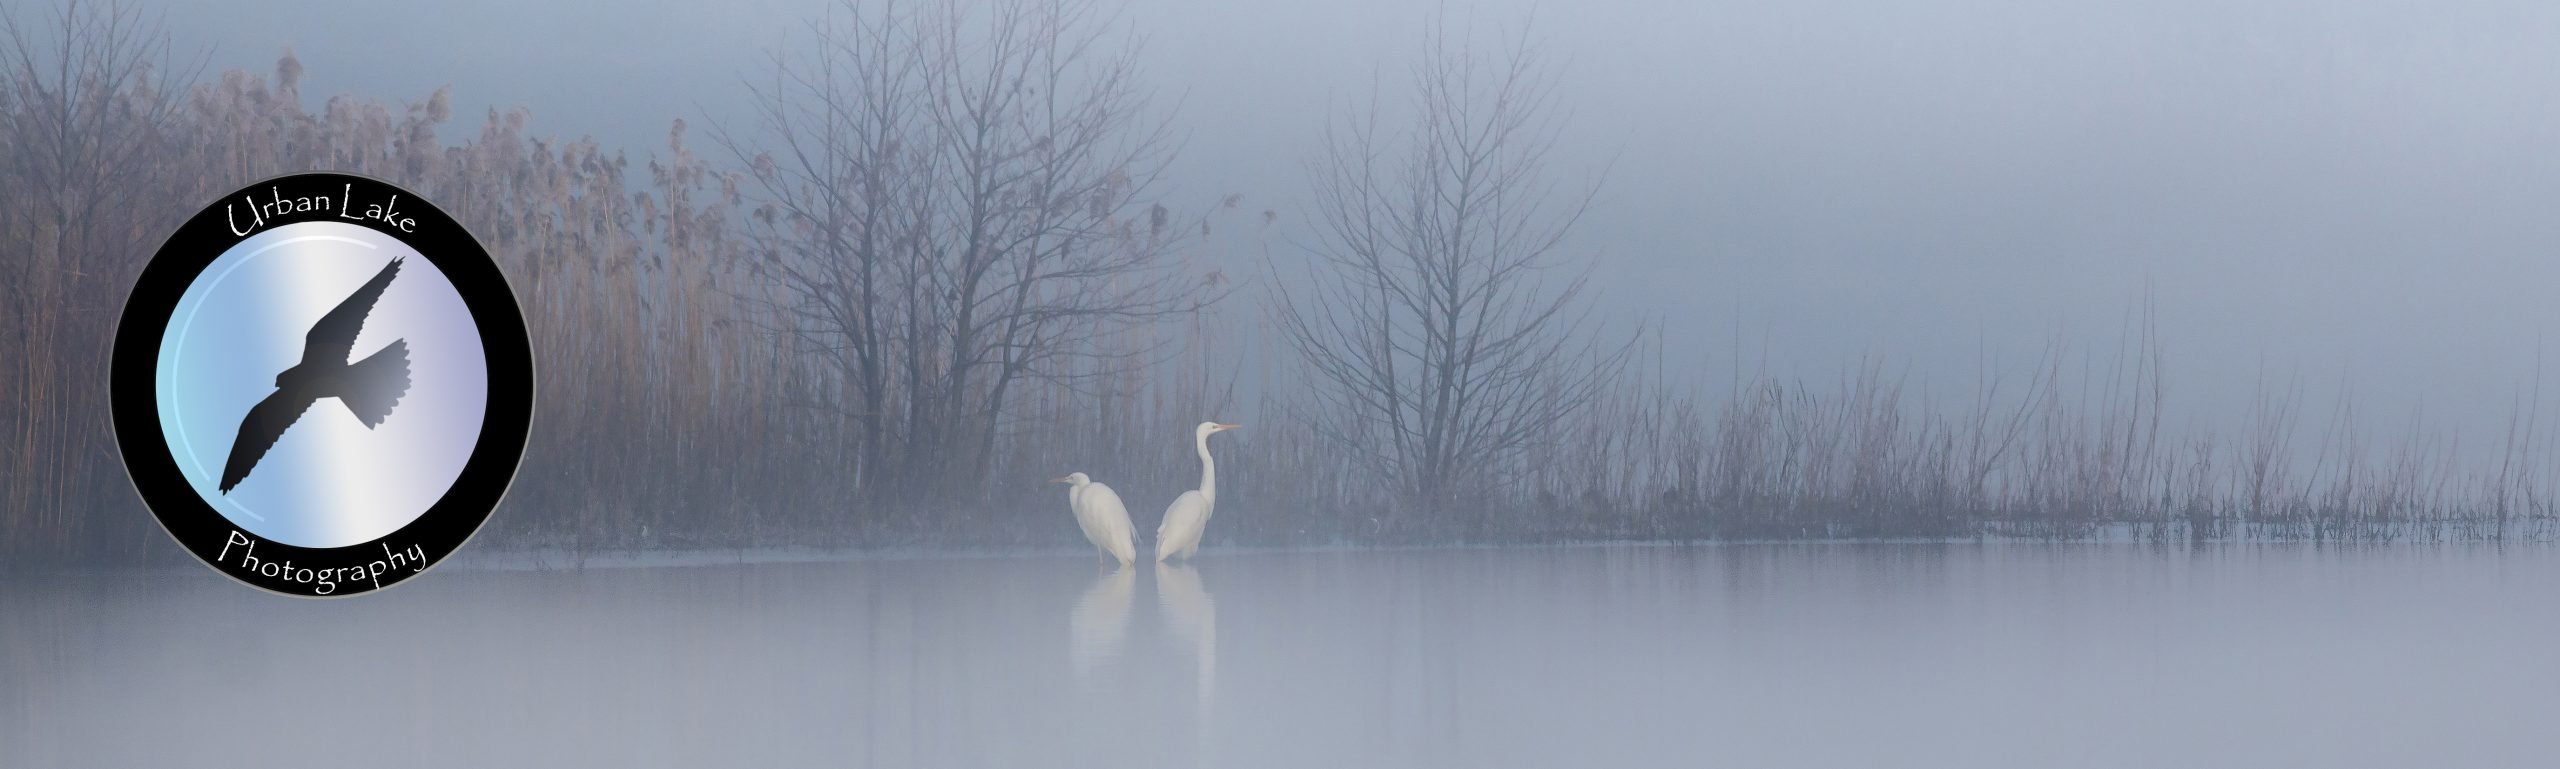 Urban Lake Photography